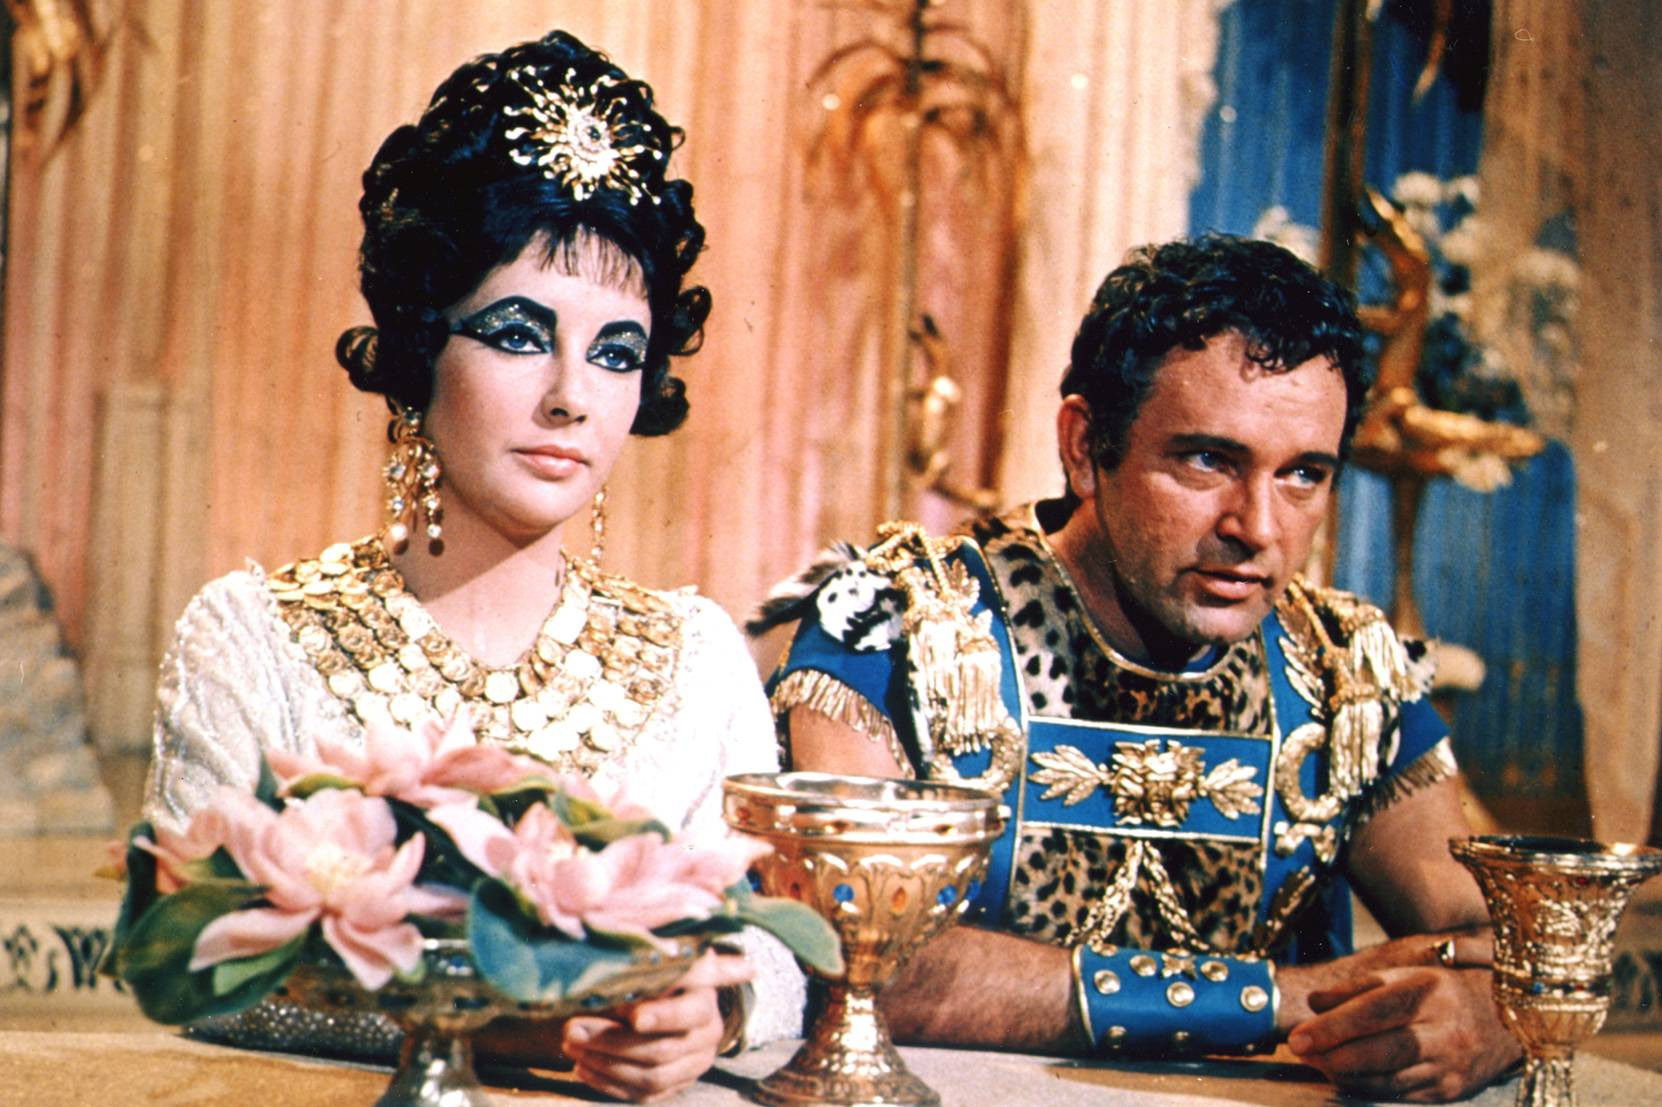 cleopatra-1963-elizabeth-taylor-16282265-1662-1107.jpg